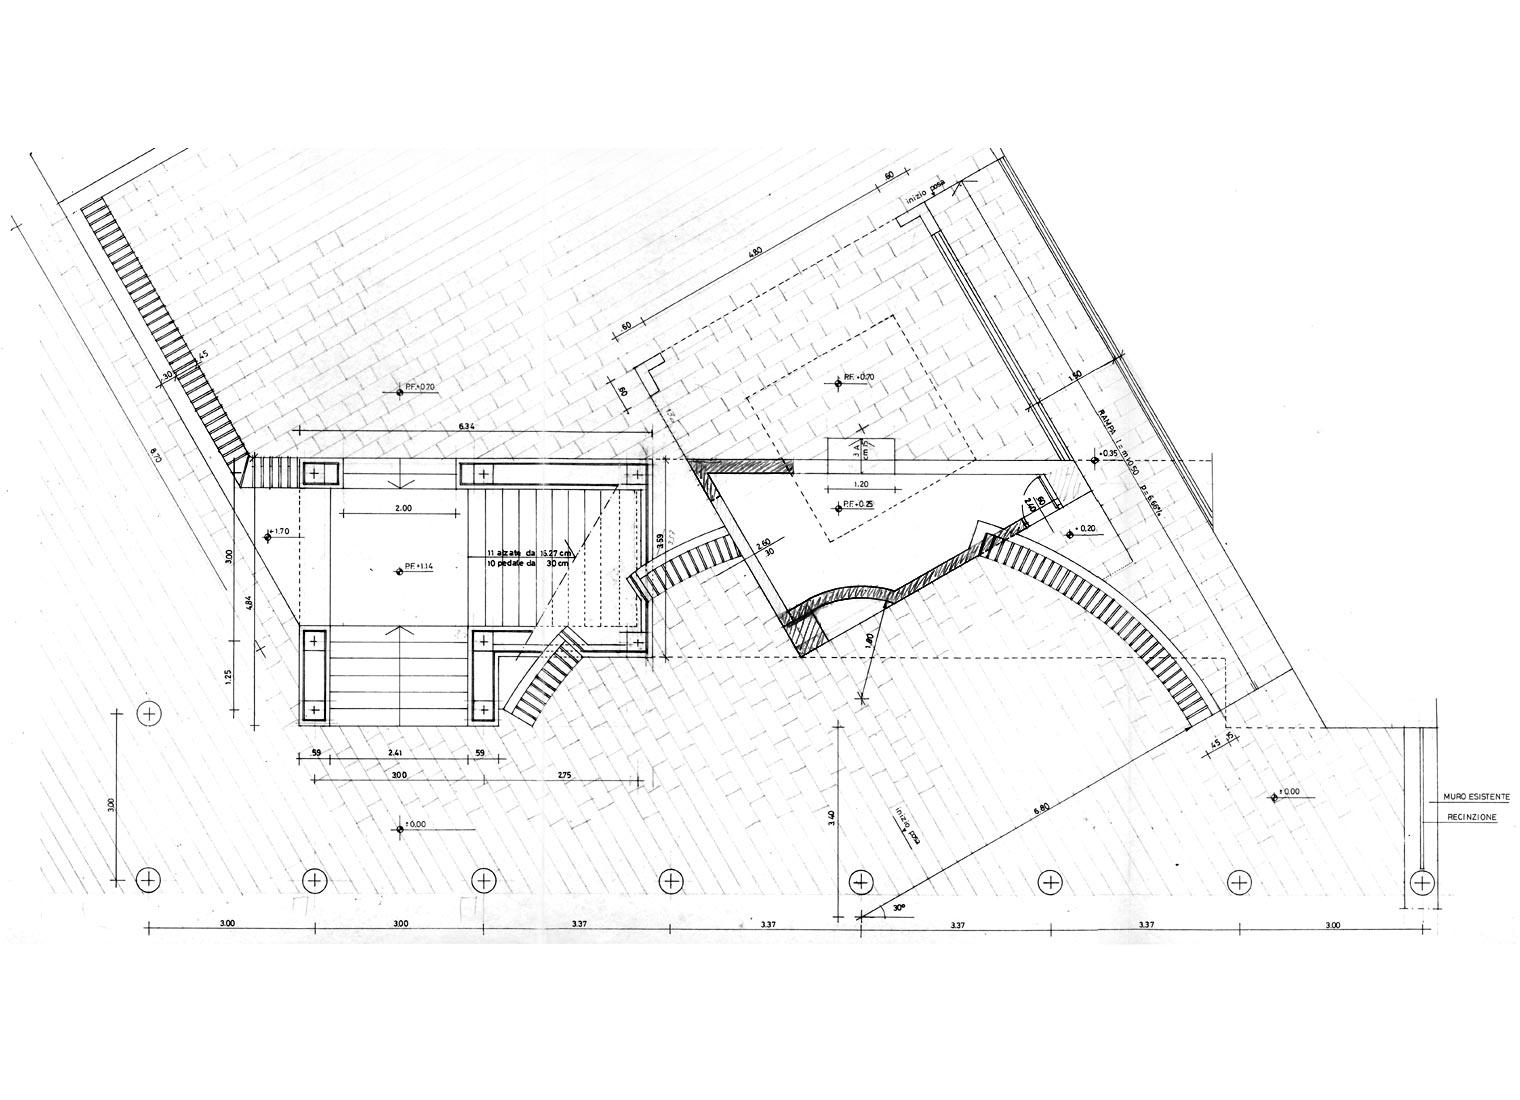 vk-architetti_sanmichele_piazza